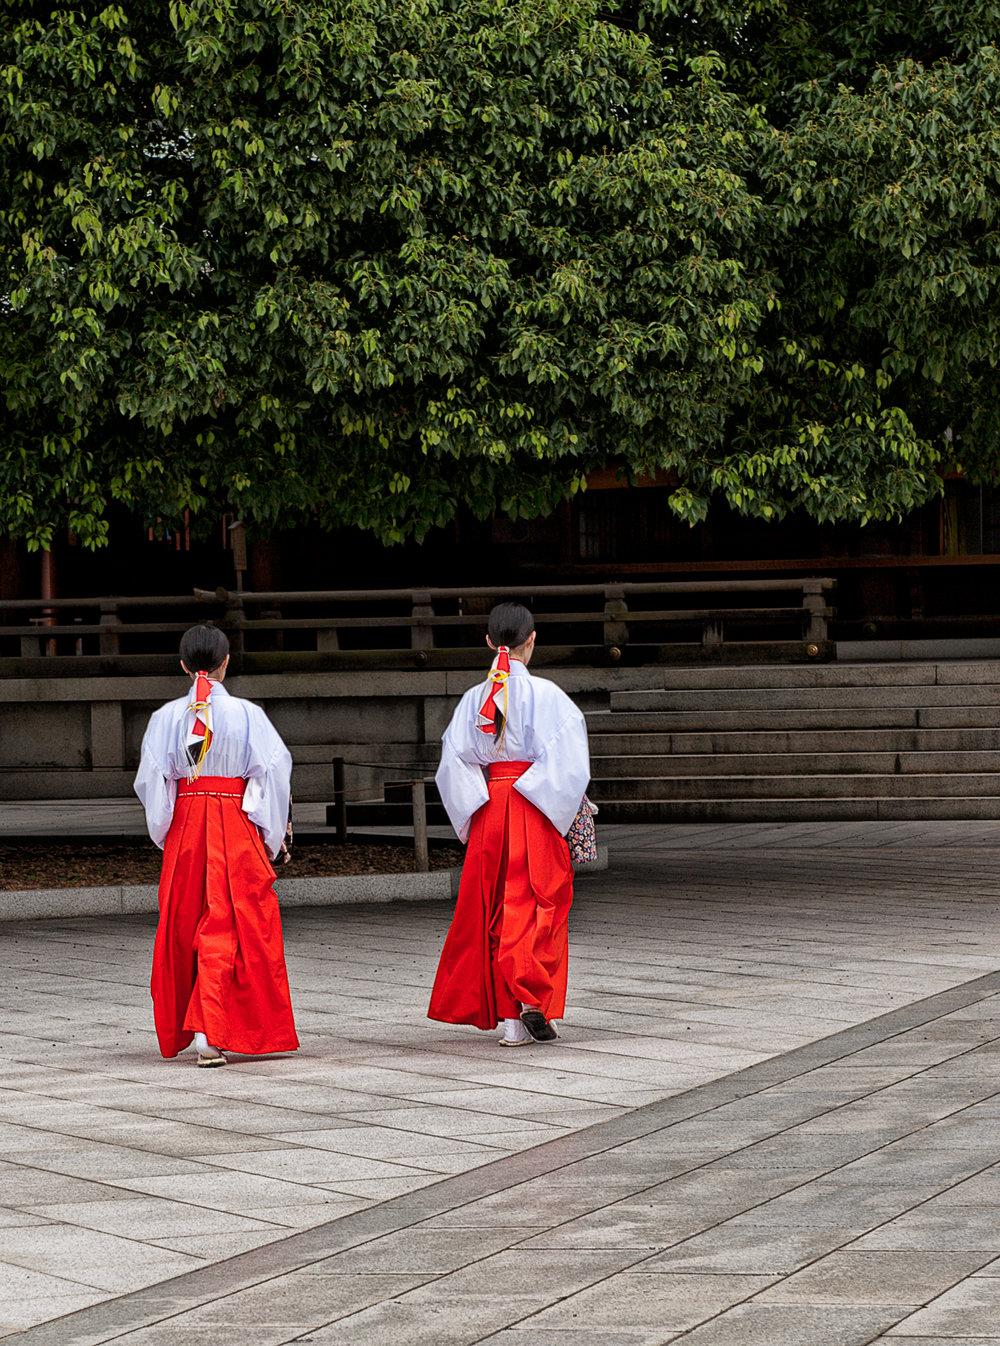 Japan-John Bardell-0210a.jpg